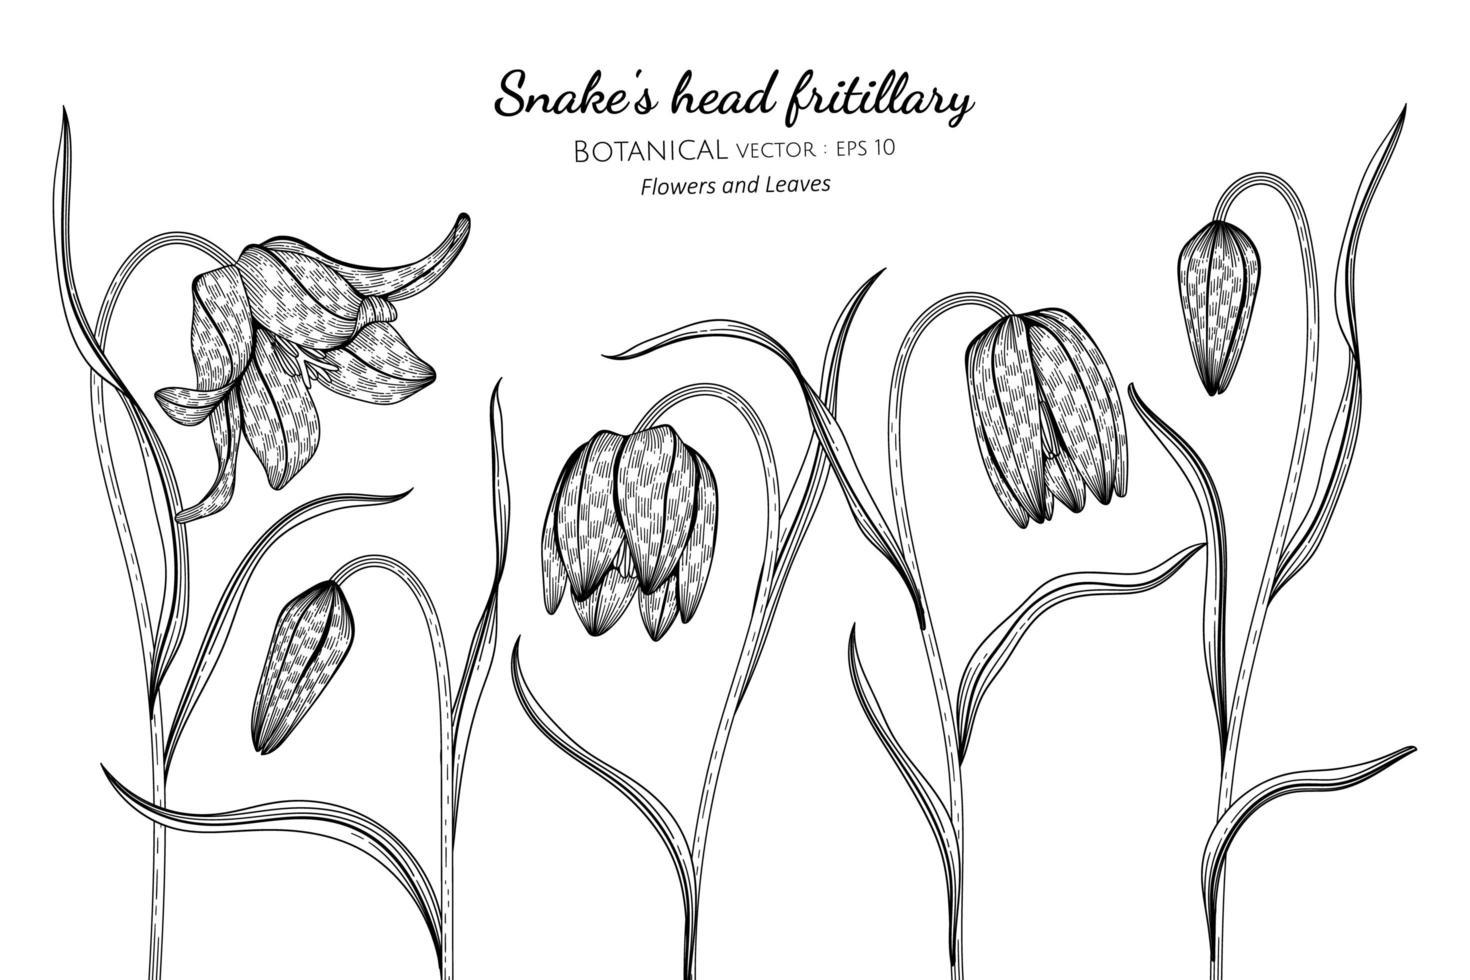 Hand drawn snake's head fritillary flower vector